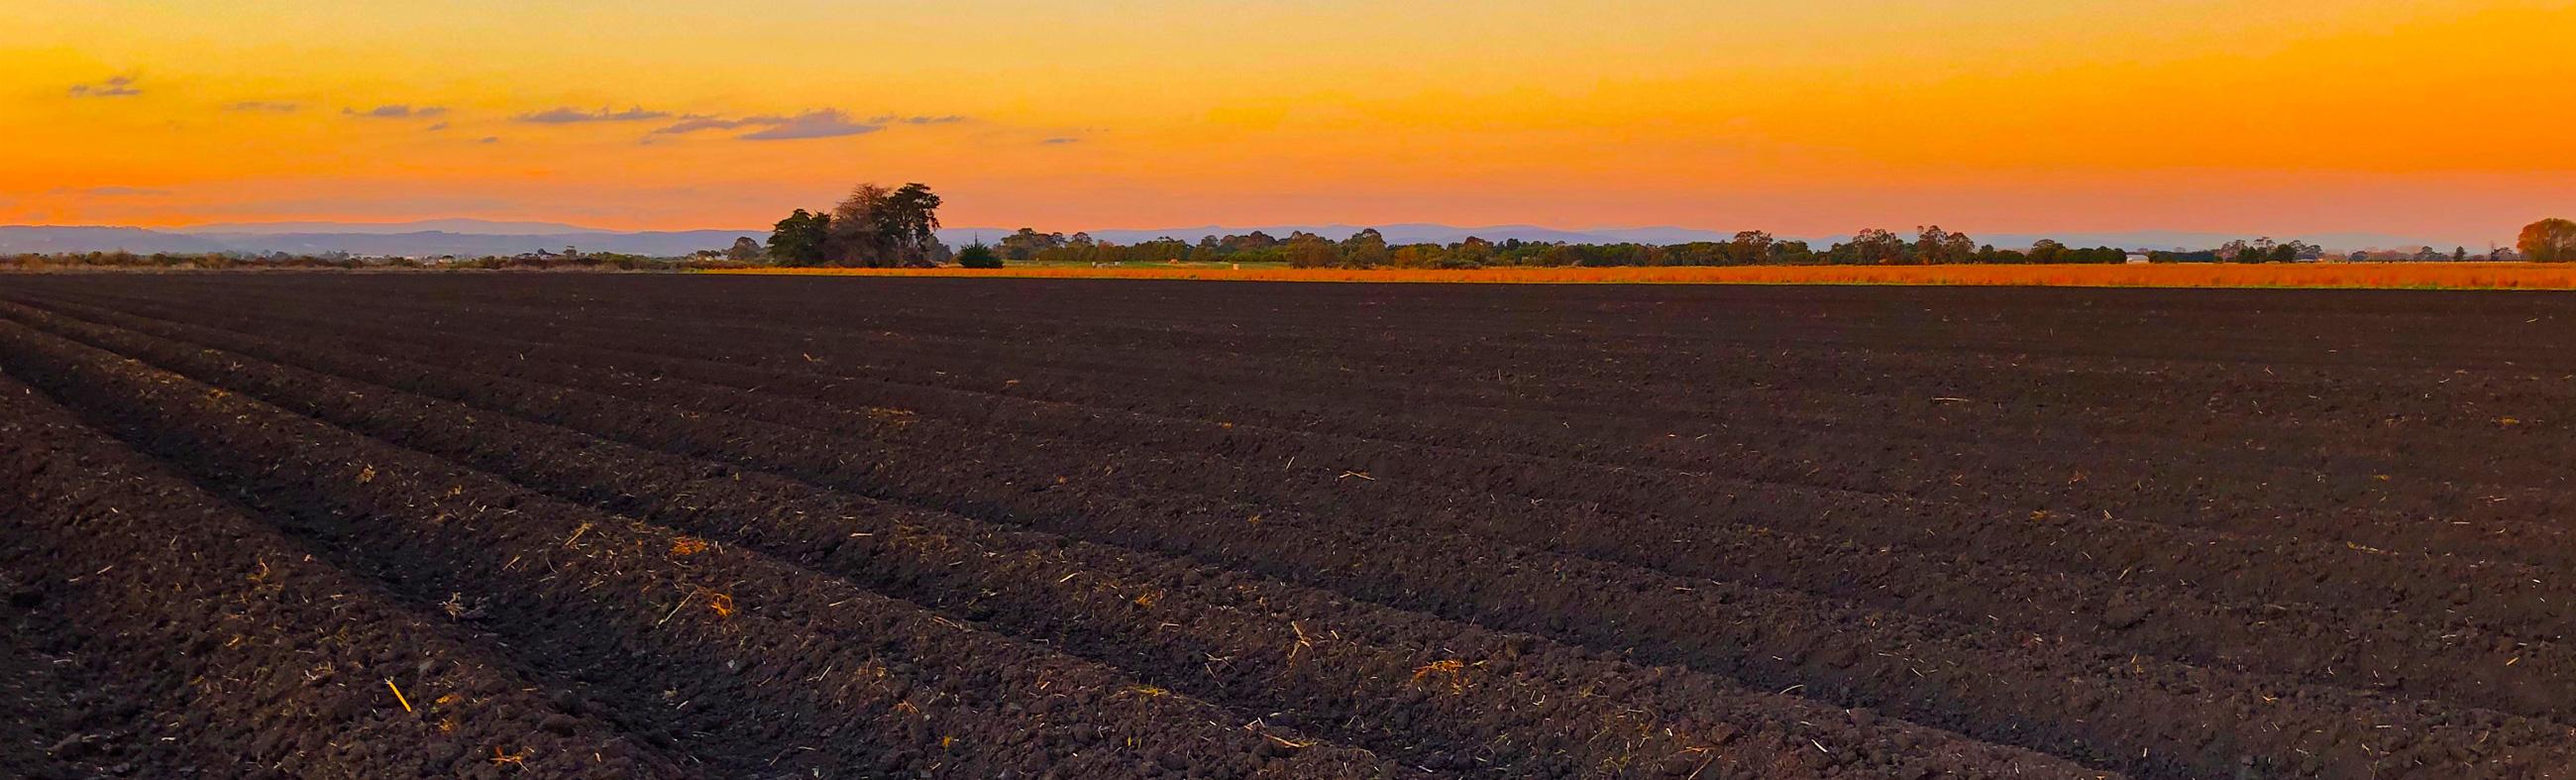 Asparagus farming sunset